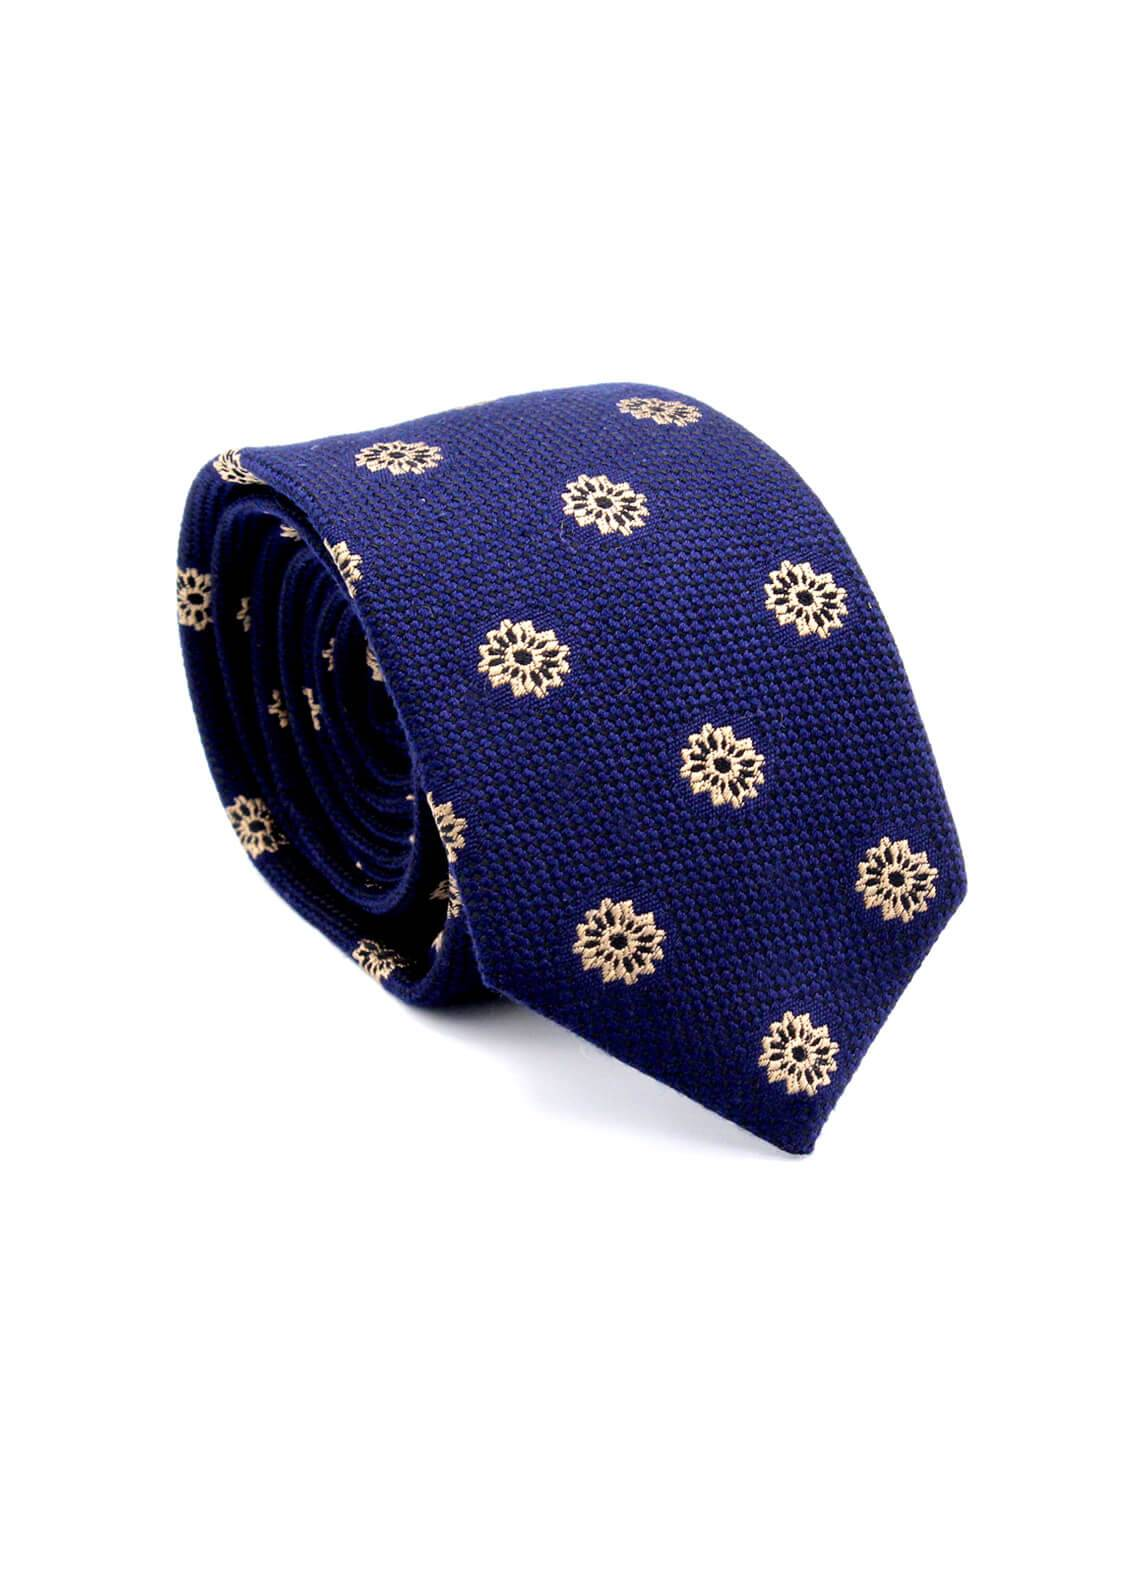 Skangen Narrow Wool Neck Tie Neck Tie SKTI-W-010 -